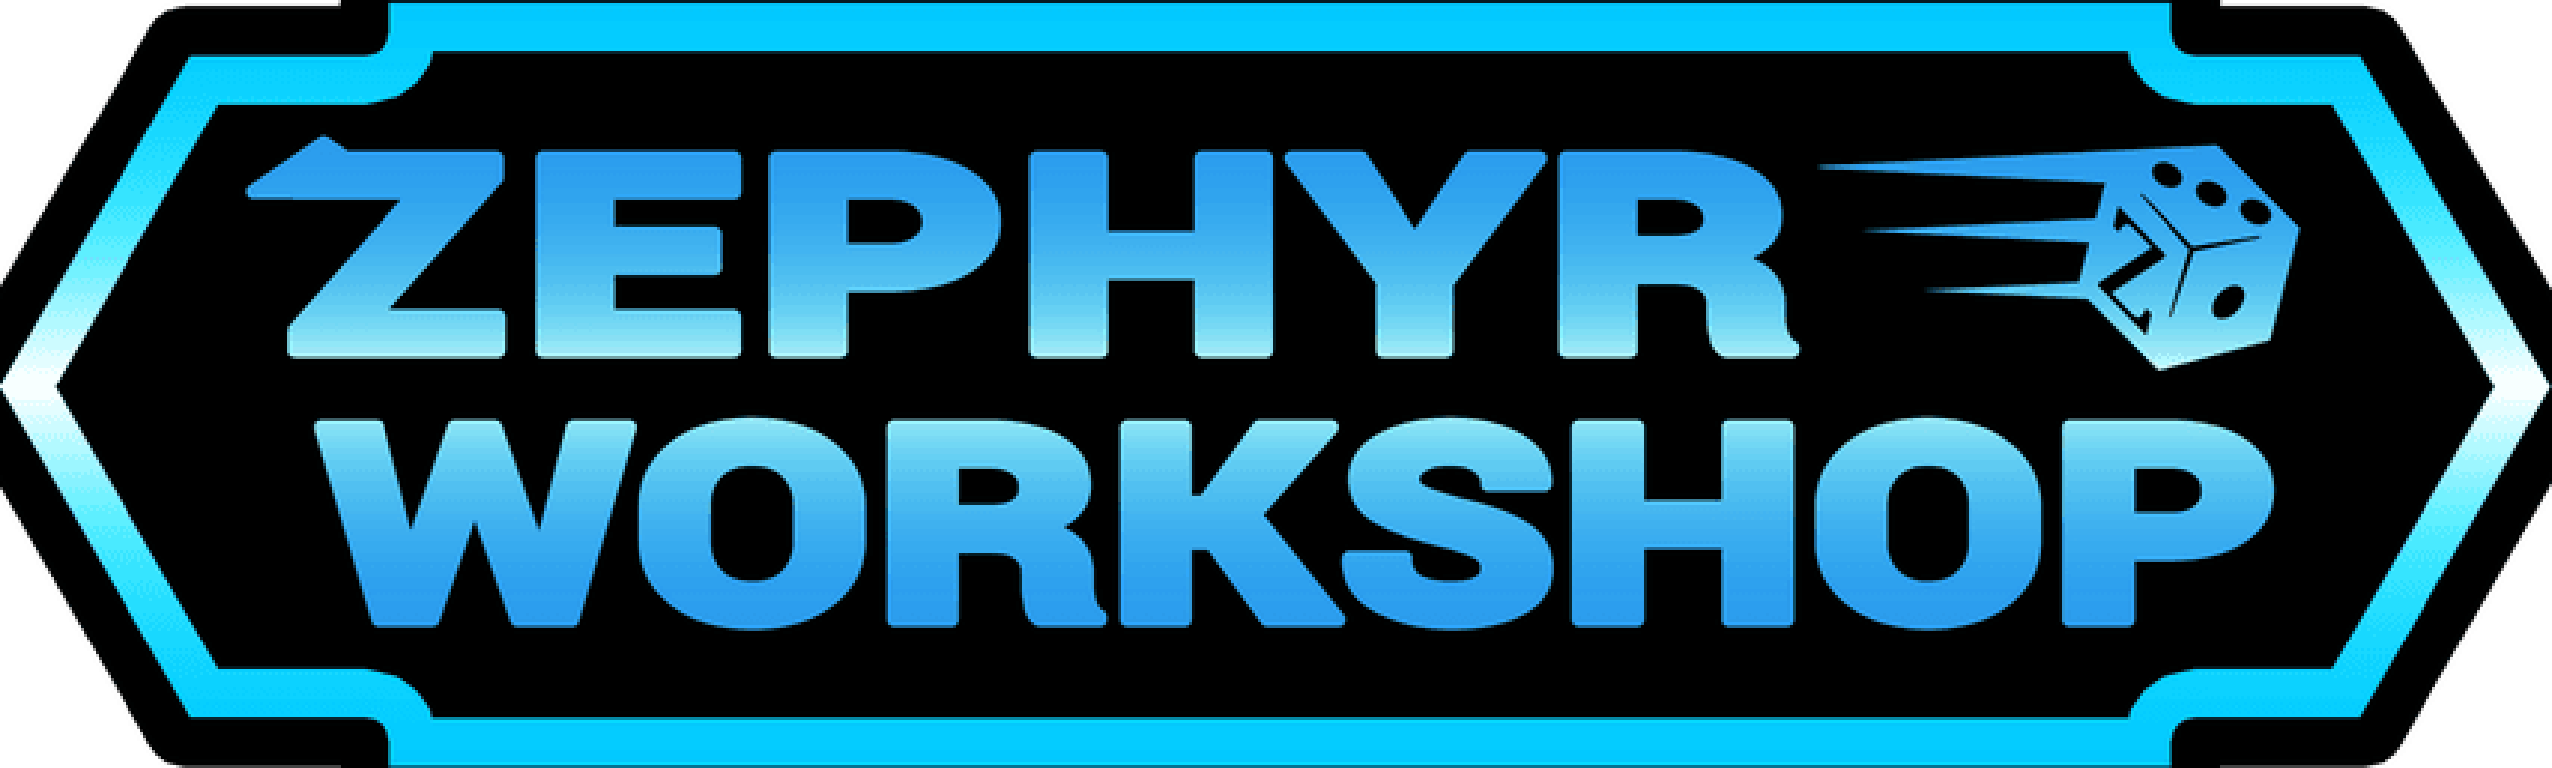 Zephyr+Workshop